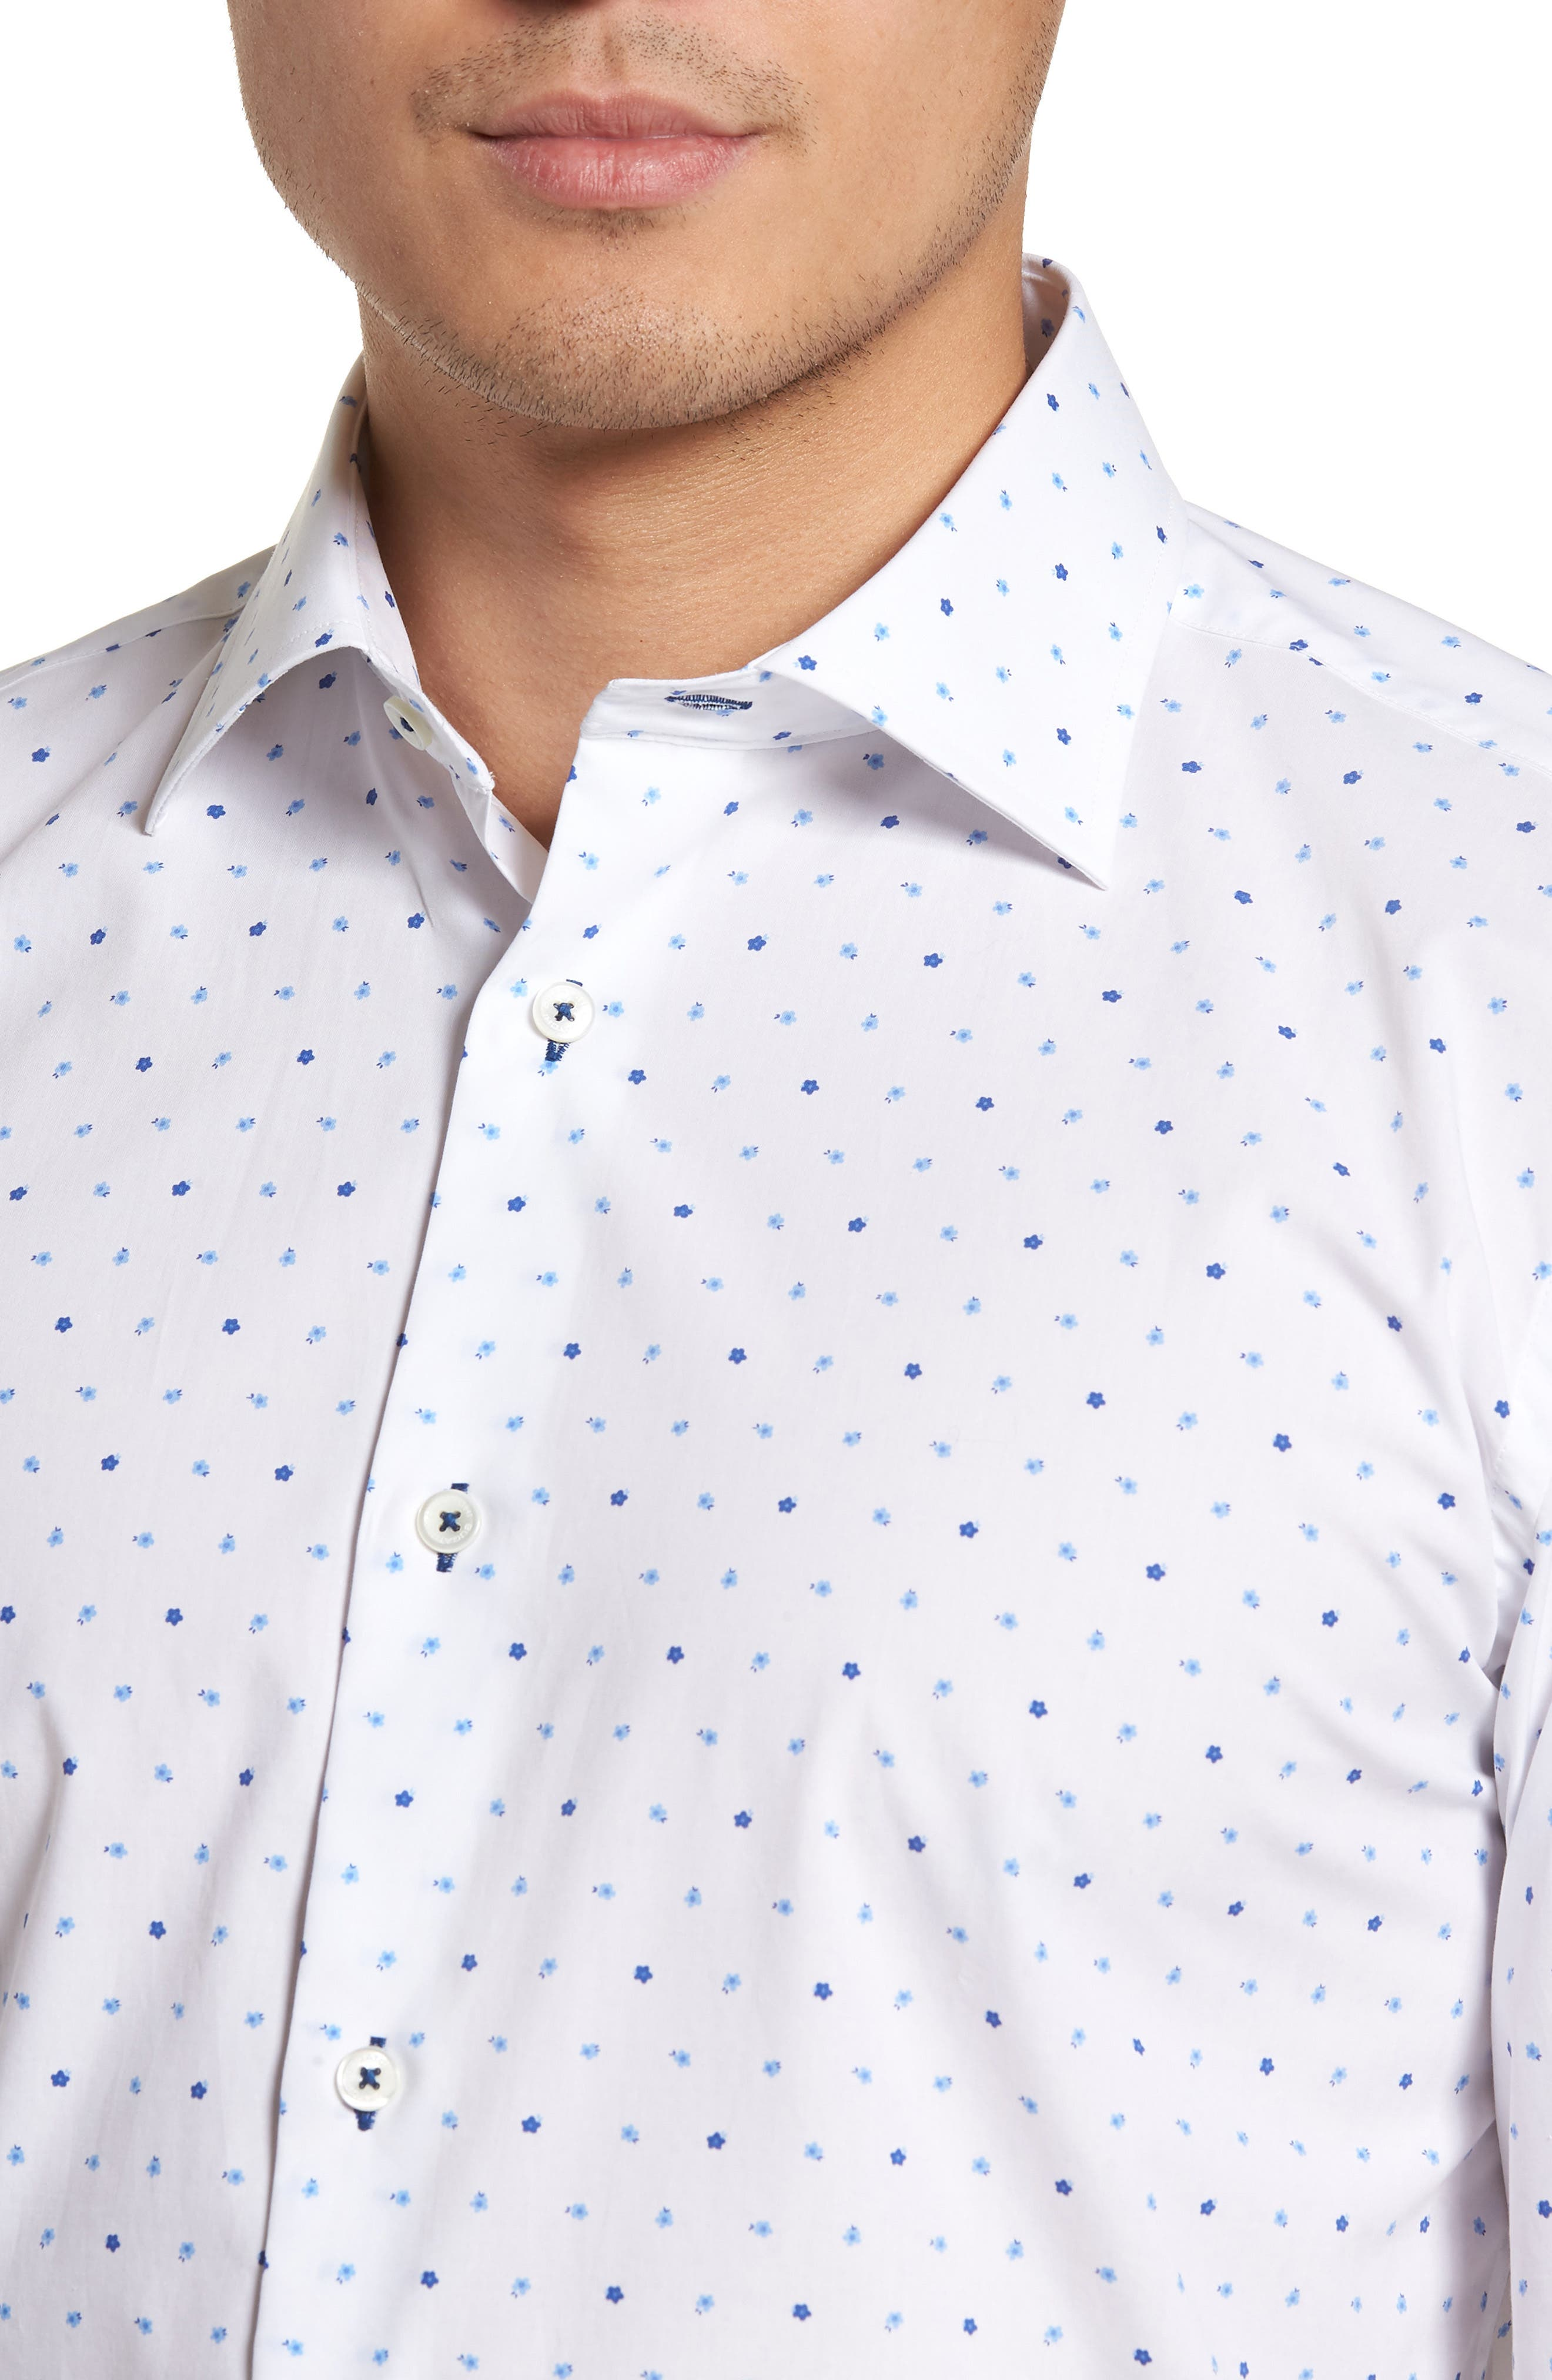 Trim Fit Print Dress Shirt,                             Alternate thumbnail 2, color,                             Classic Blue/ White